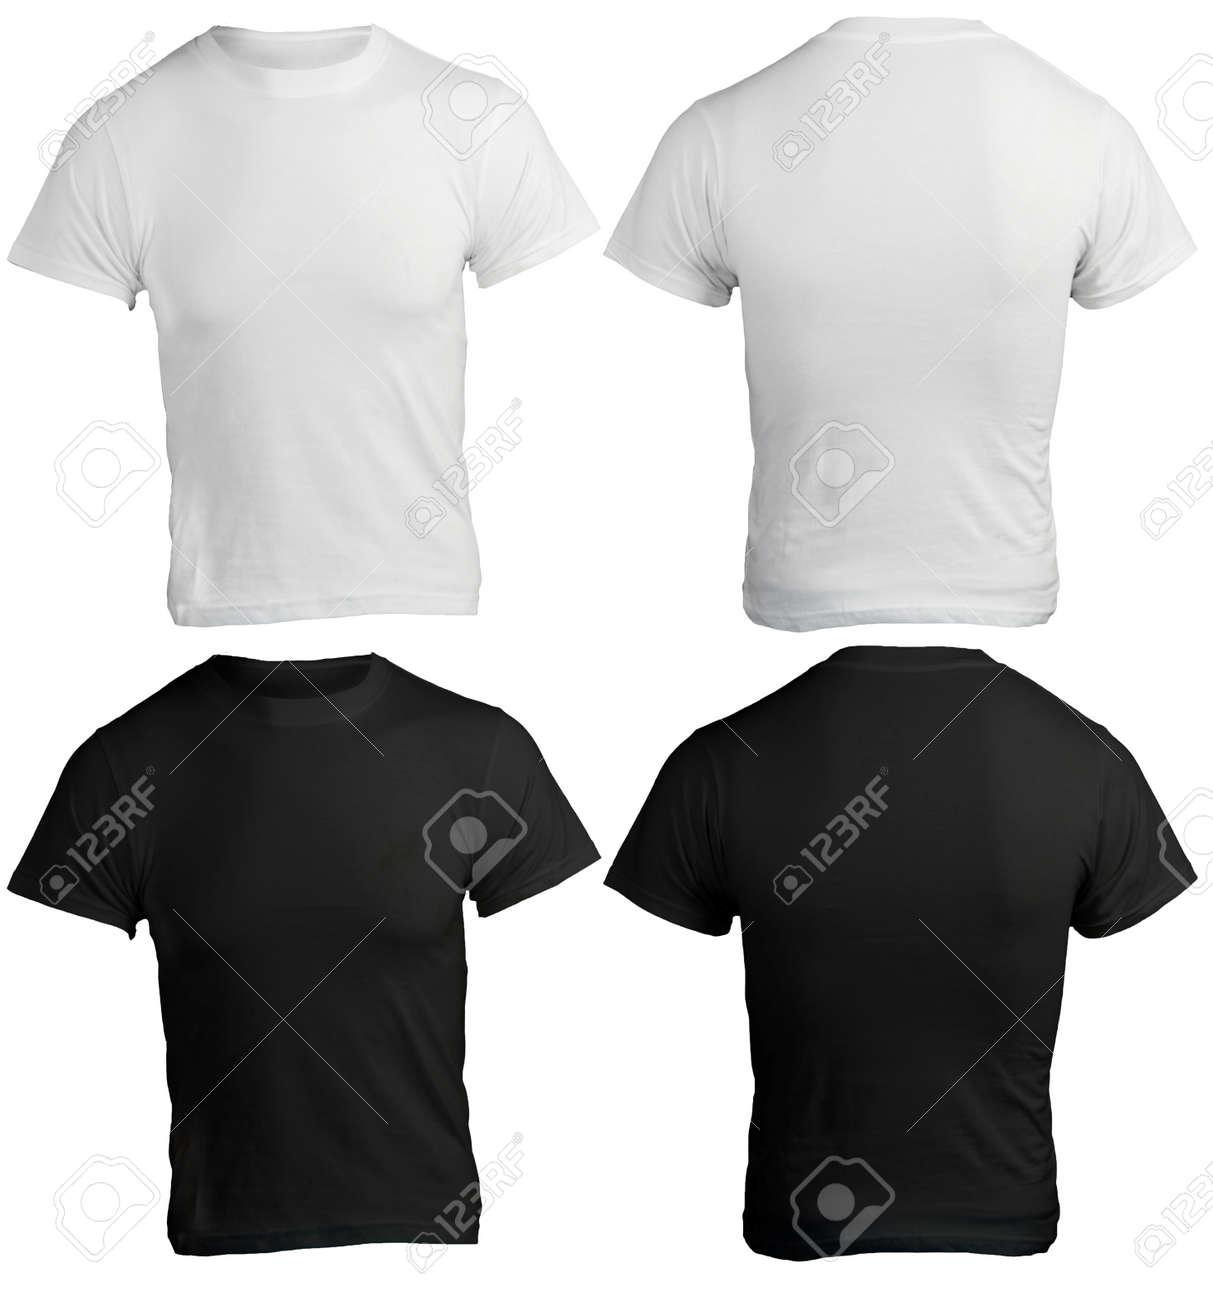 T shirt black and white designs - Men S Blank Black And White Shirt Front And Back Design Template Stock Photo 24614849